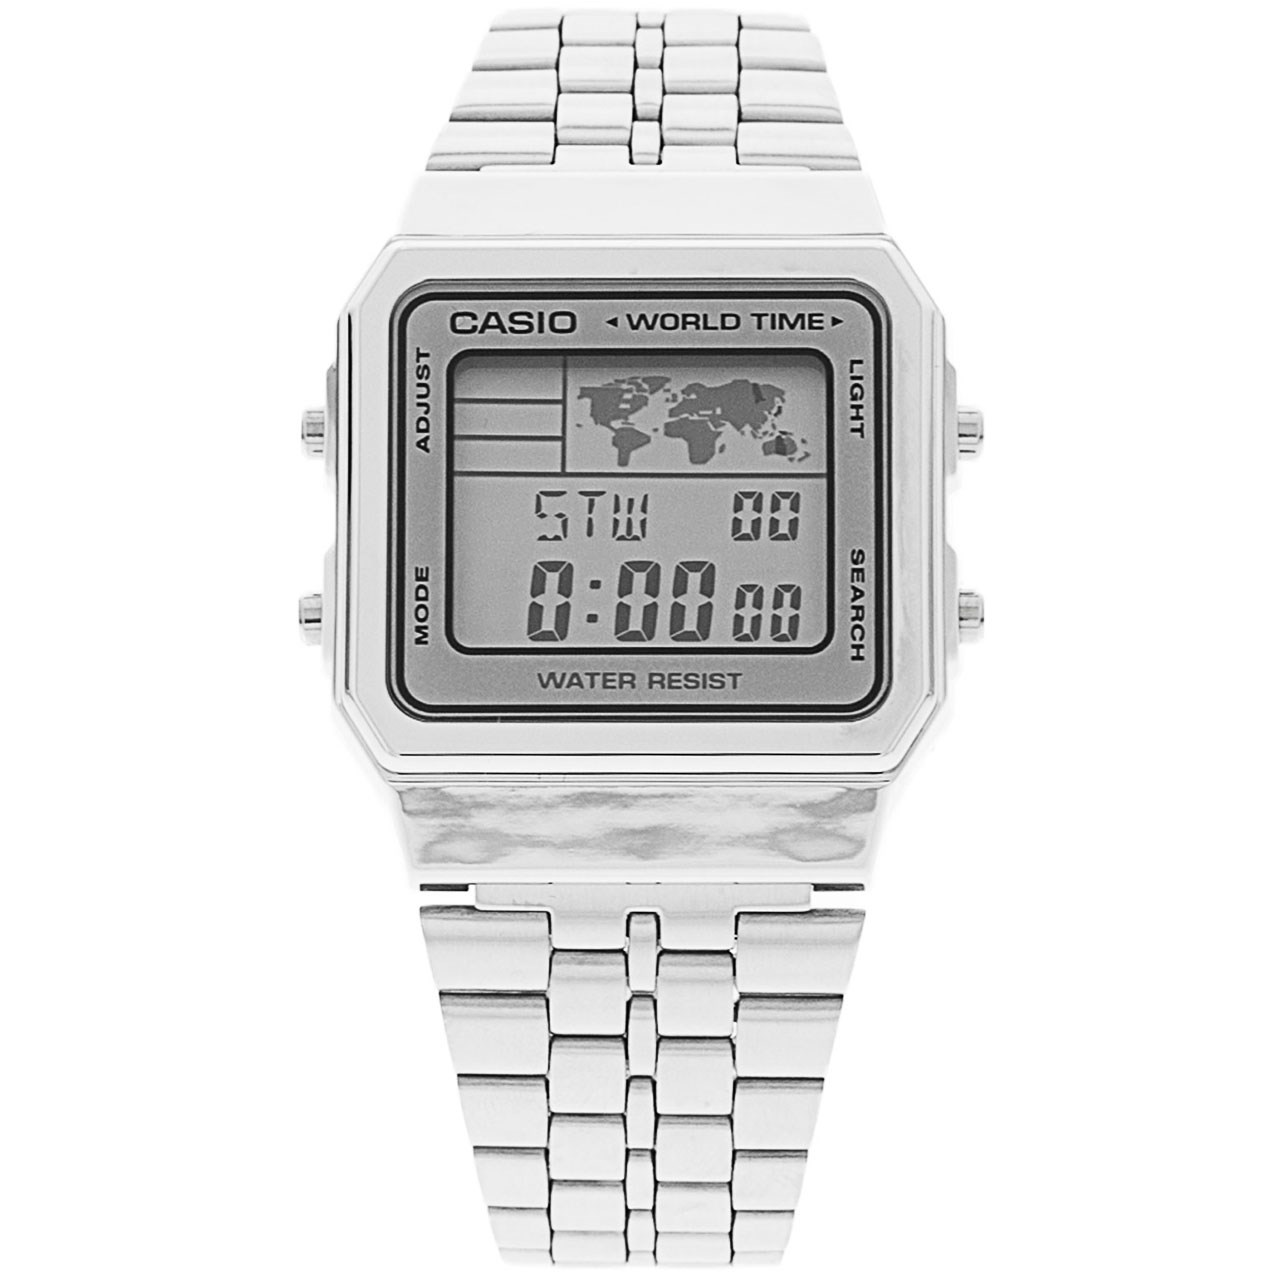 ساعت مچی دیجیتال مردانه کاسیو مدل A500WA-7DF 46